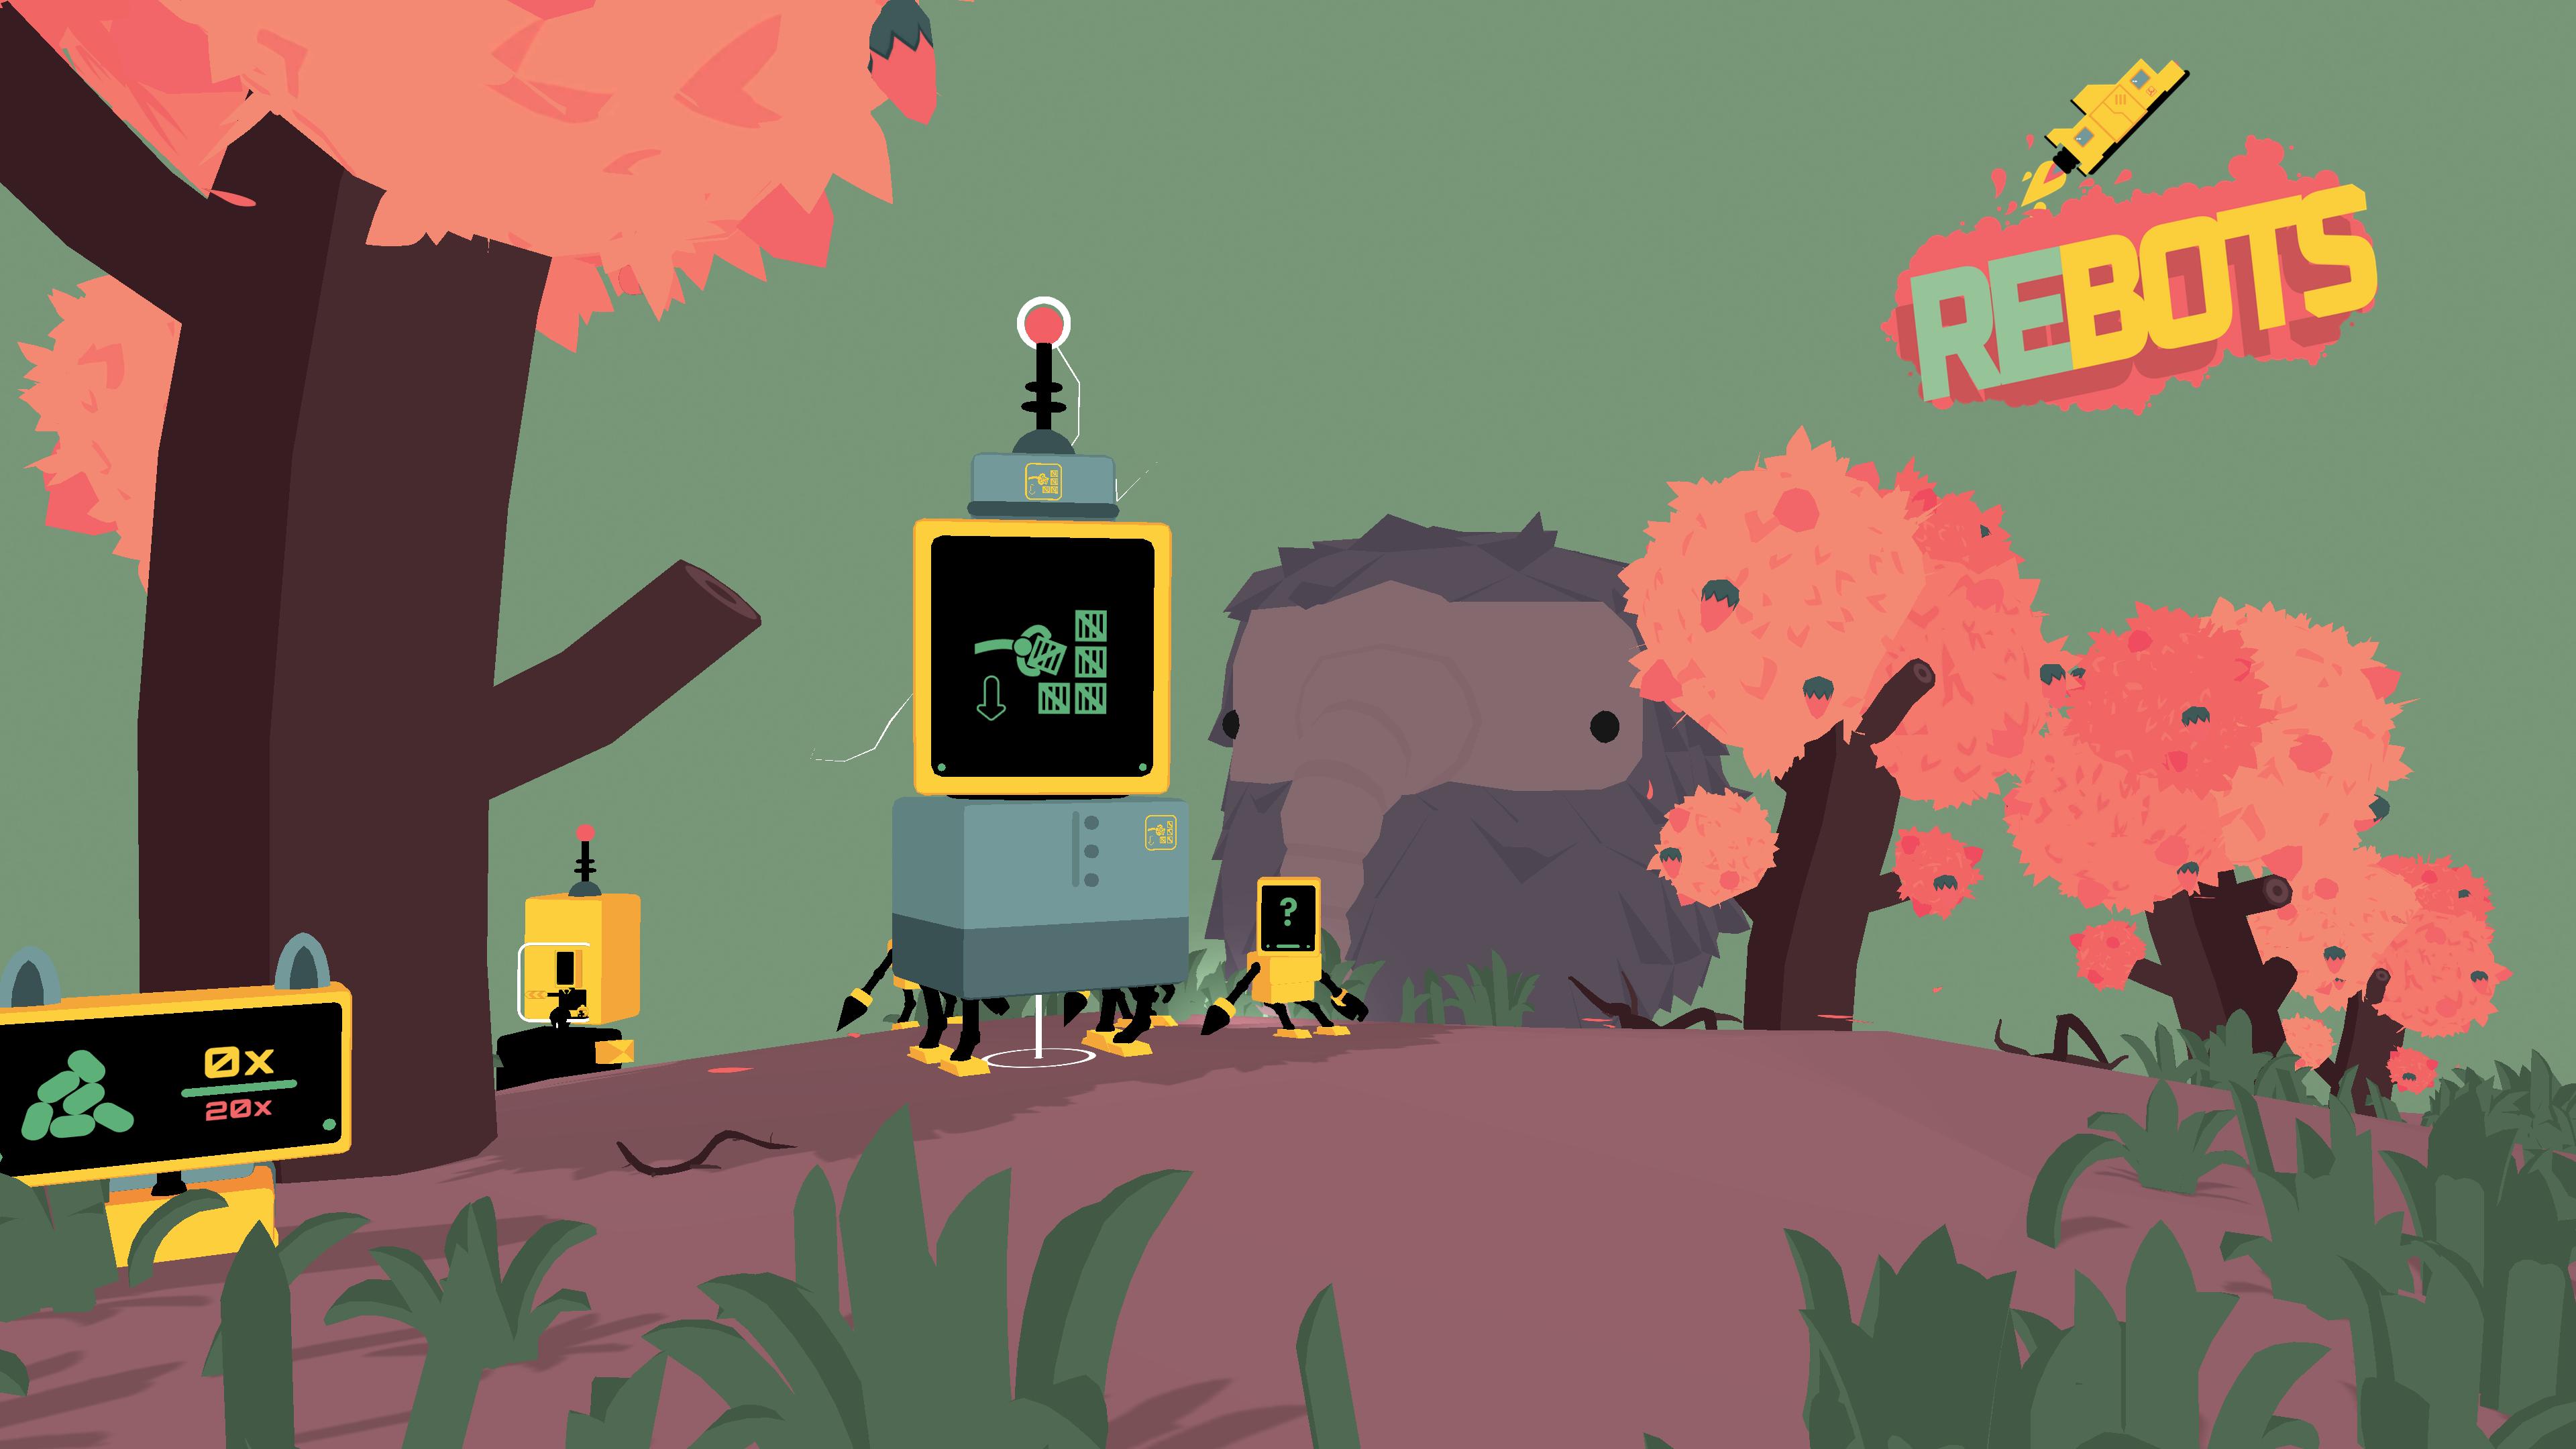 Screenshot Rebots 2